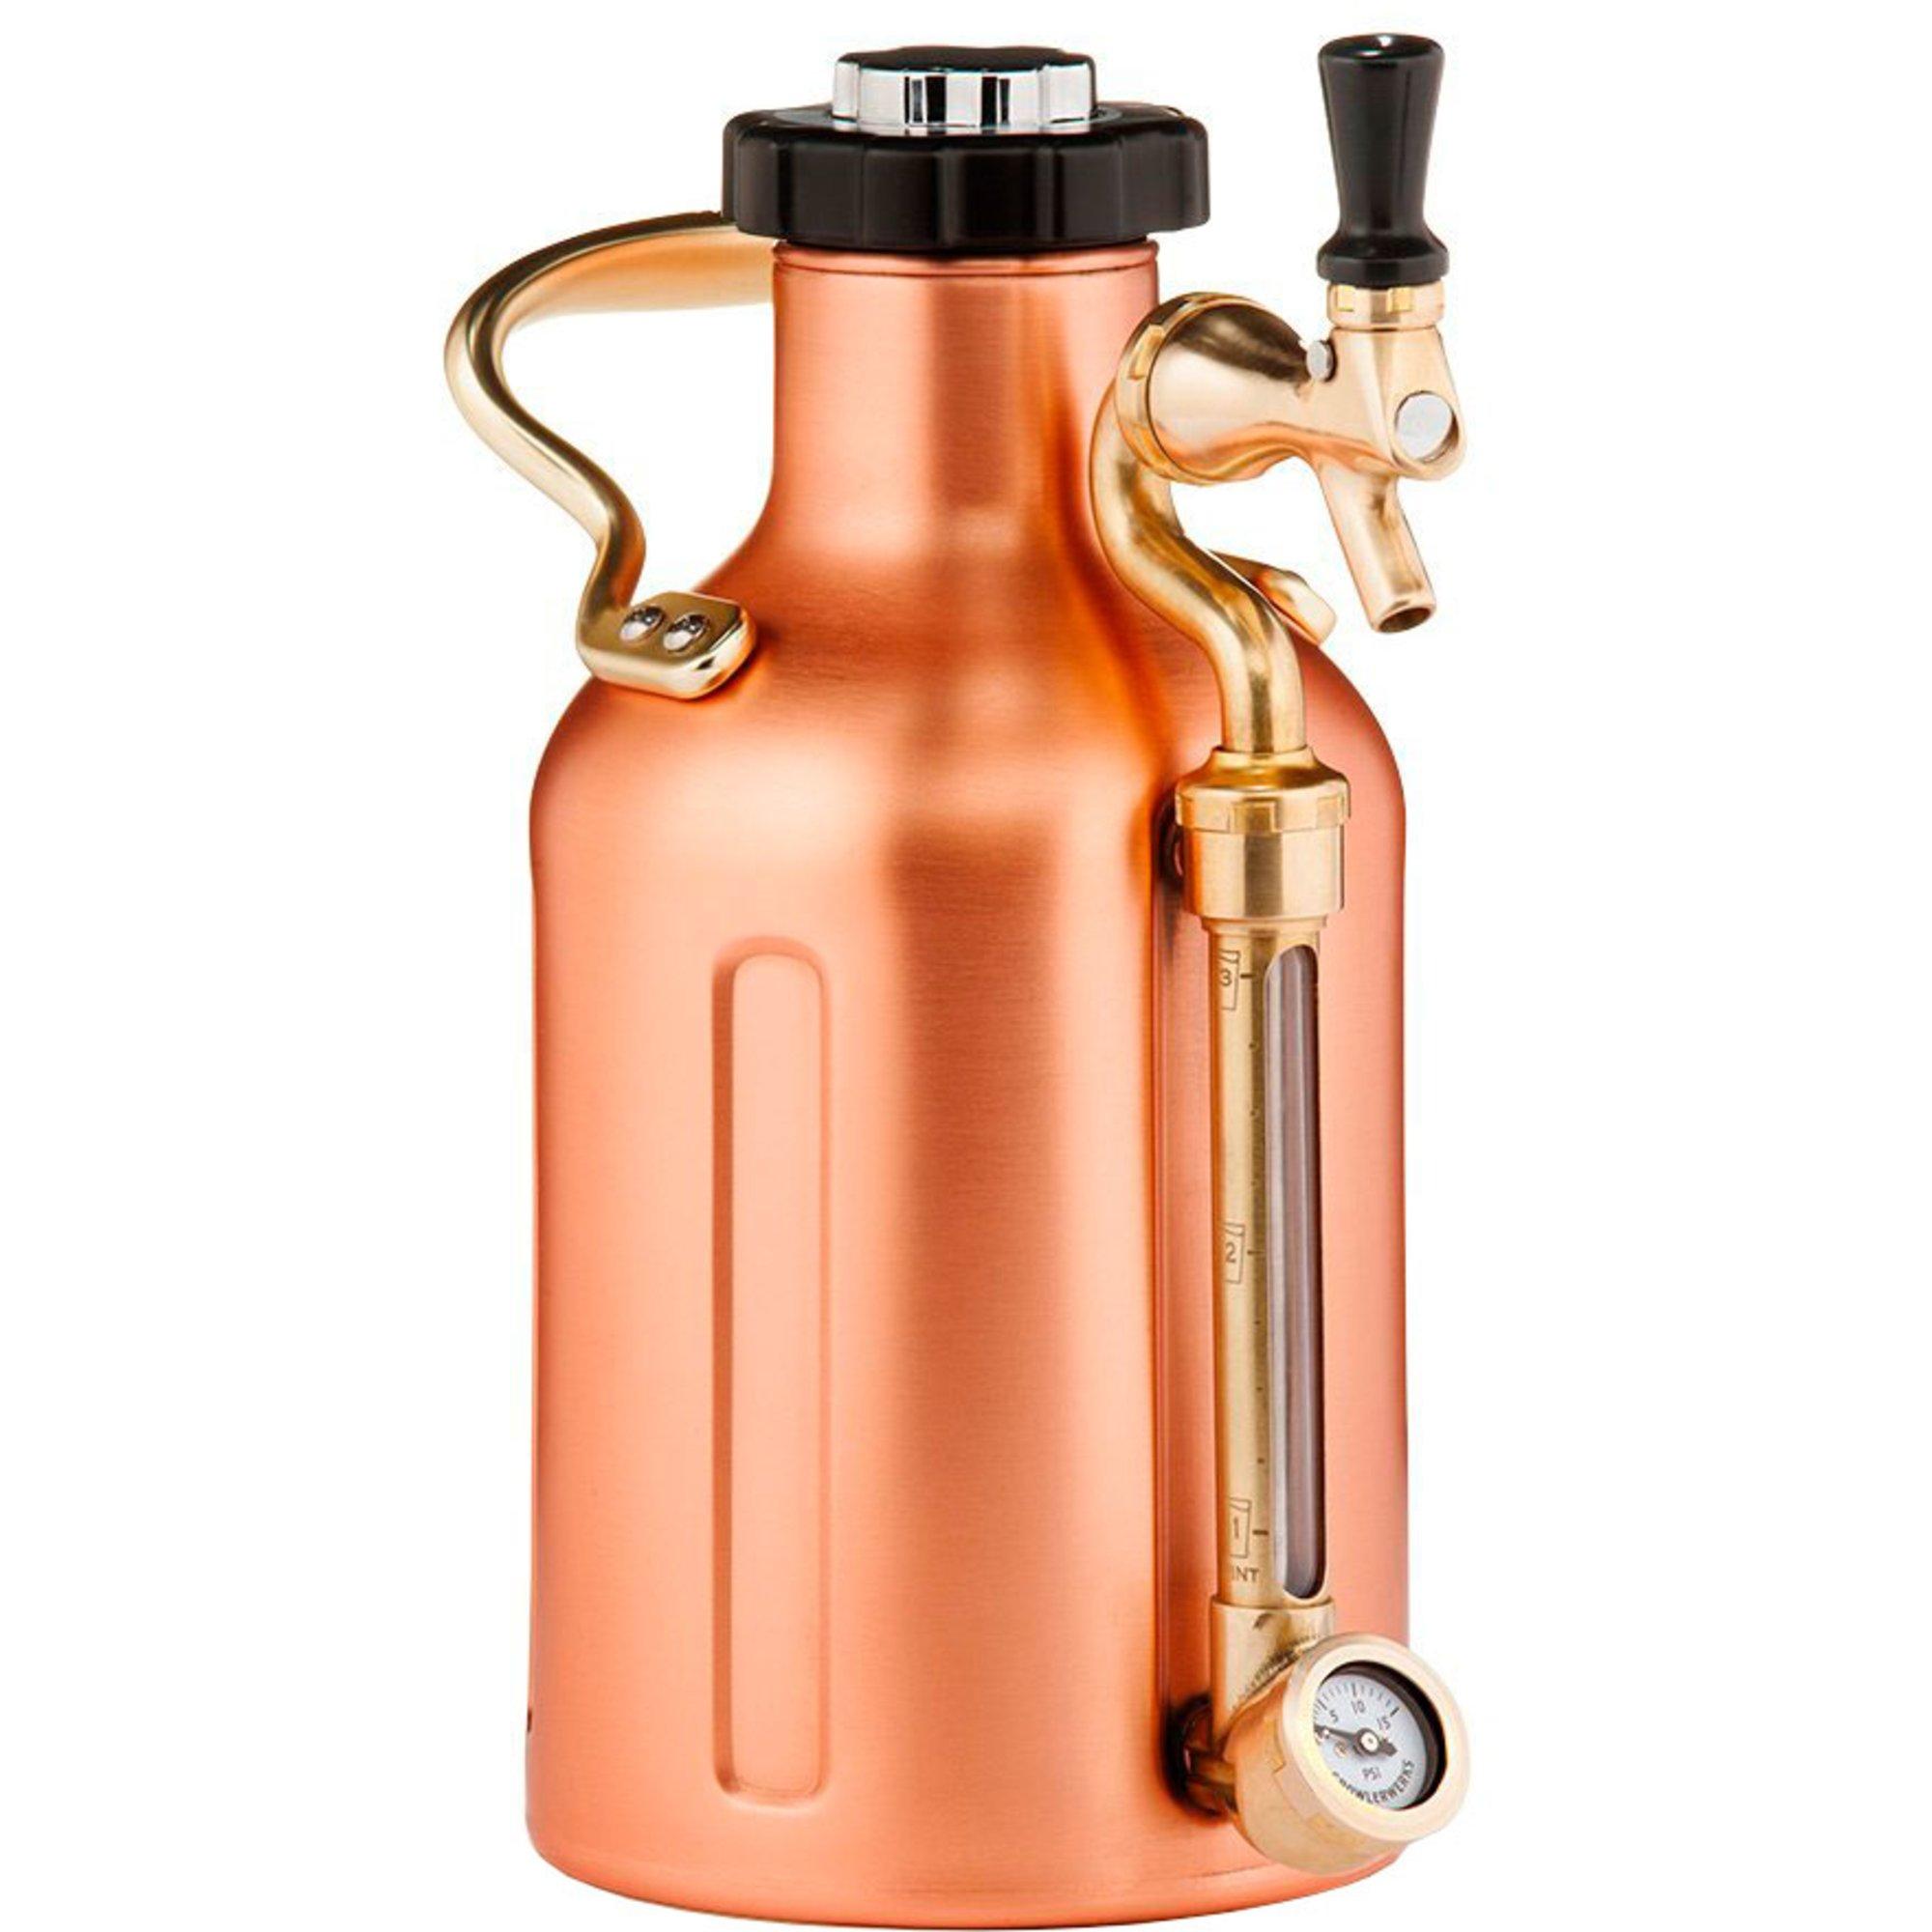 GrowlerWerks uKeg Pro koppar 19 liter